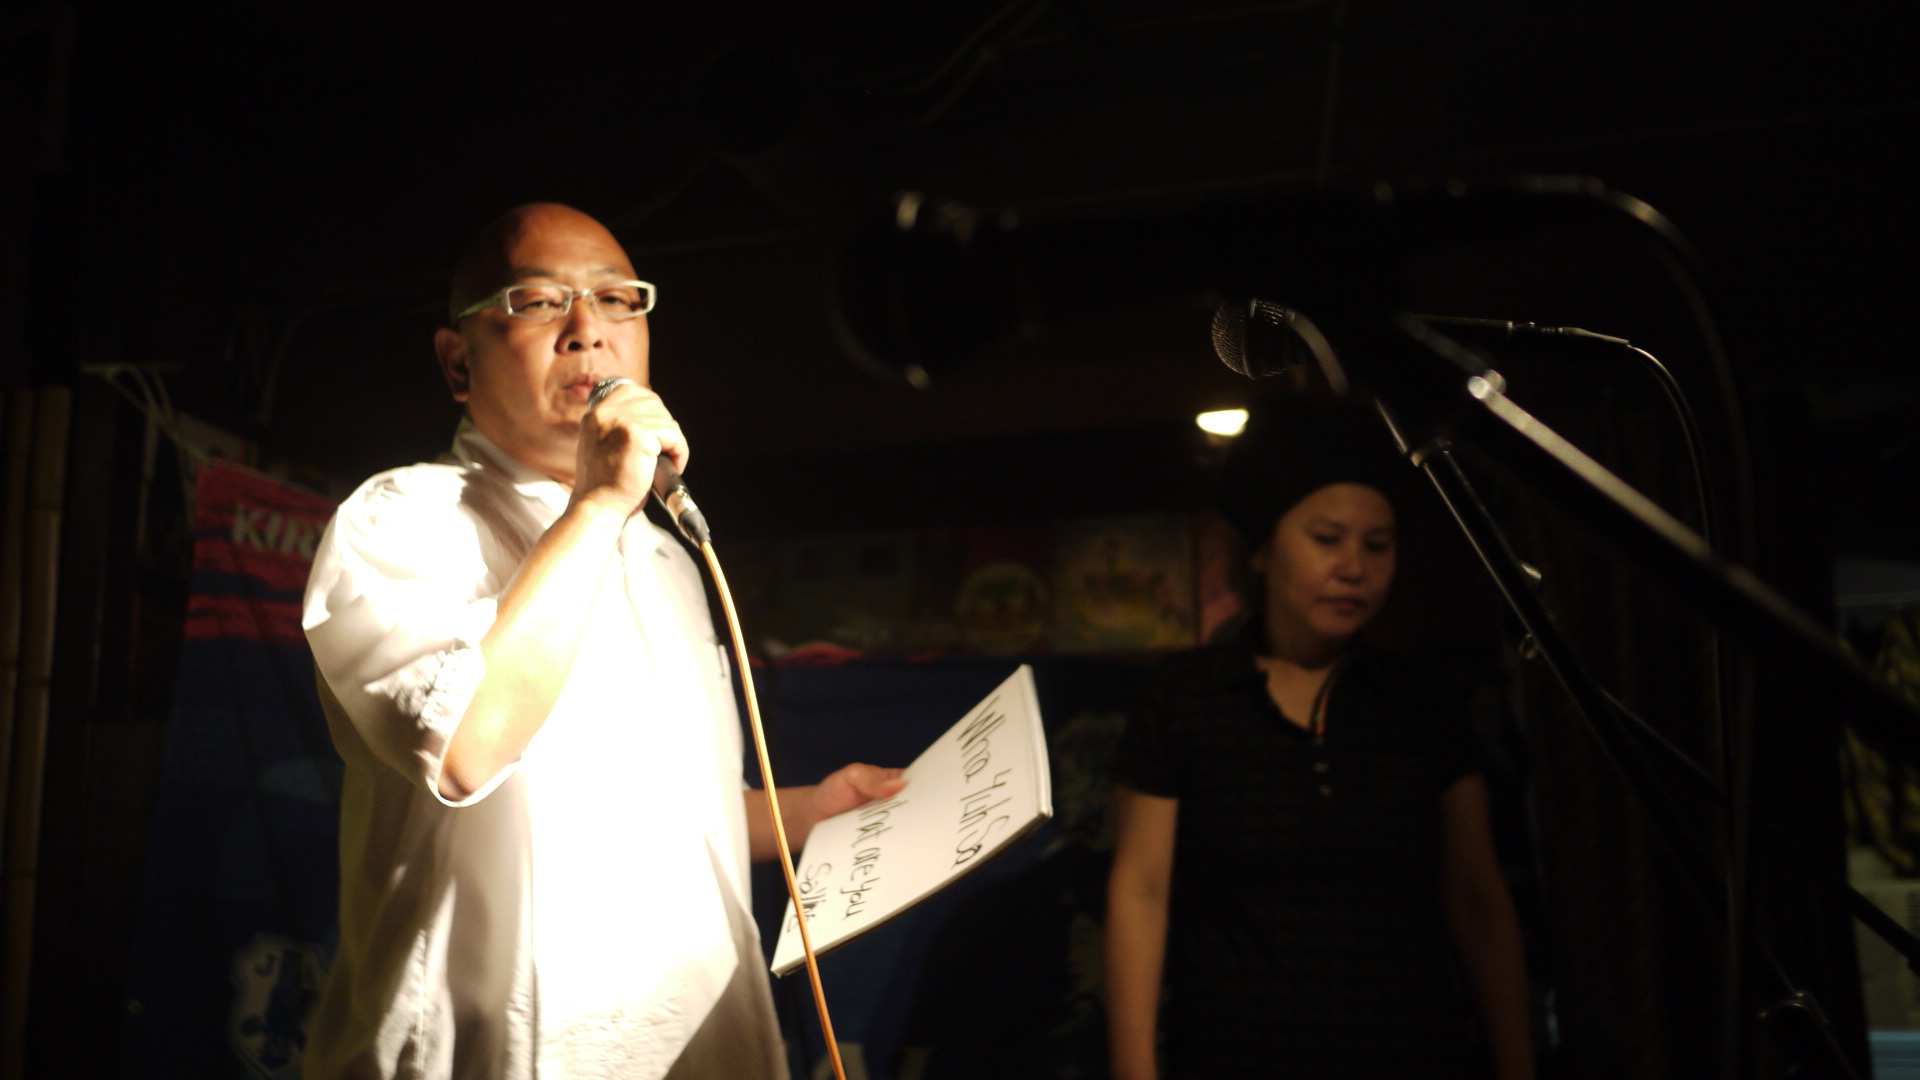 Daddy Teruki, Mr.Yen